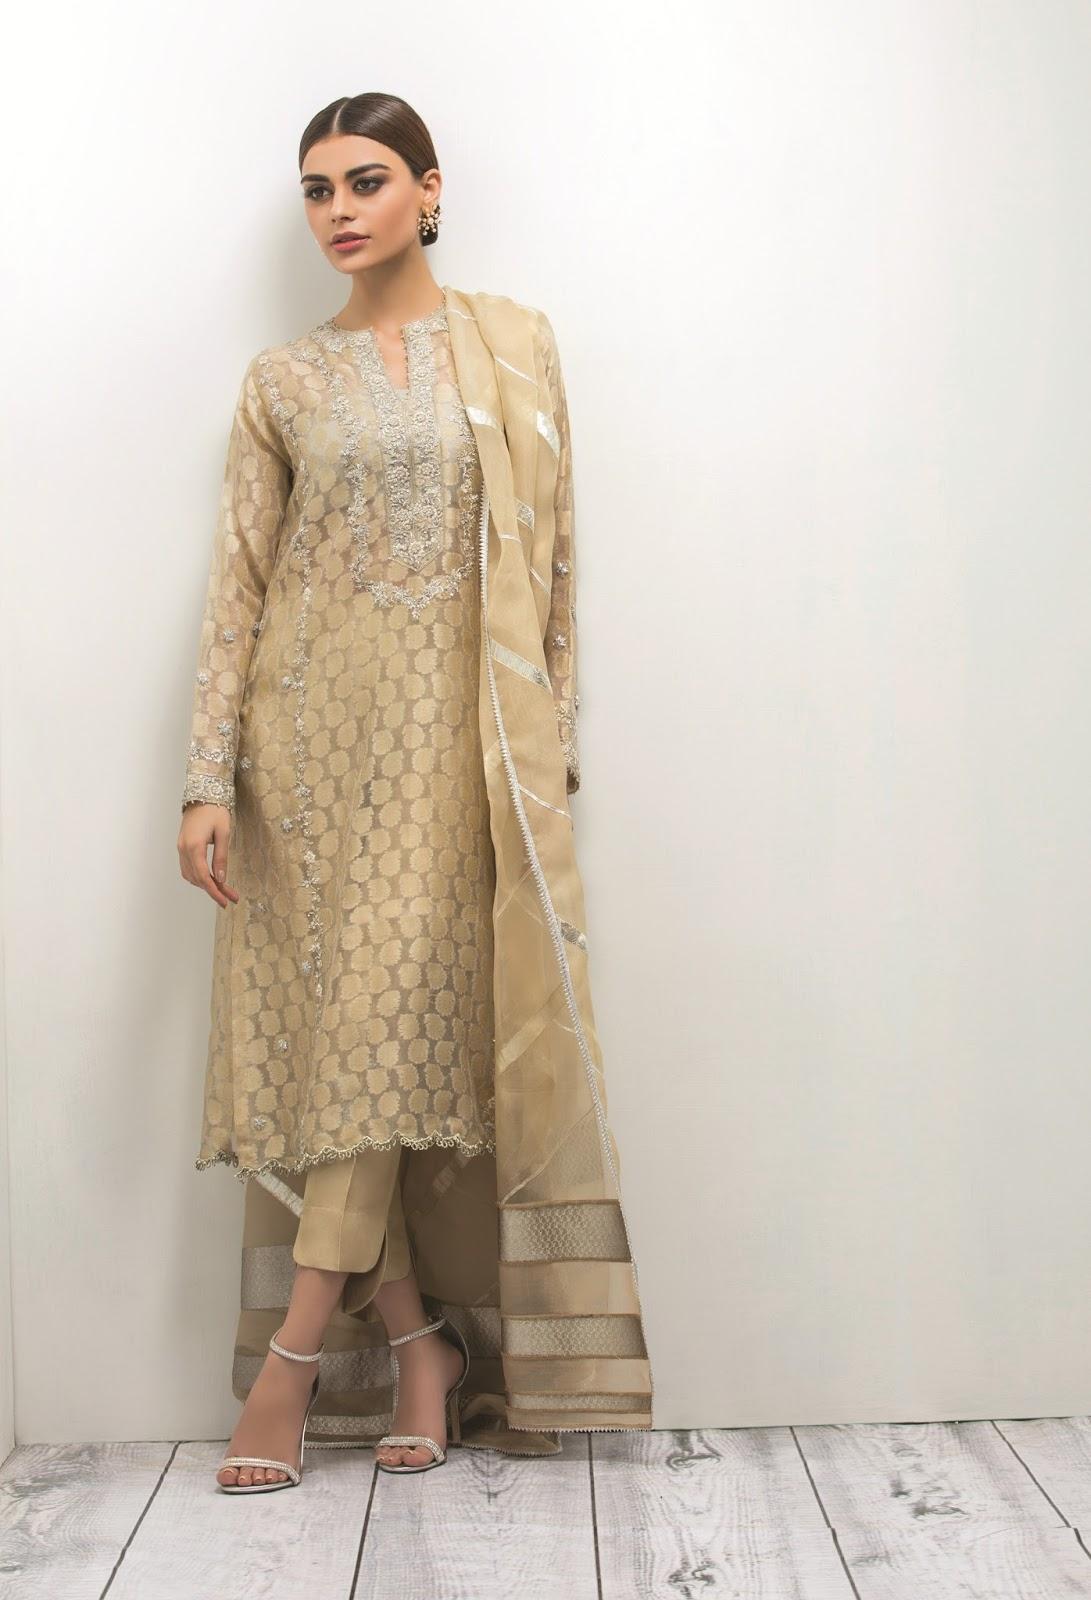 Sadaf Kanwal Pakistani actress model